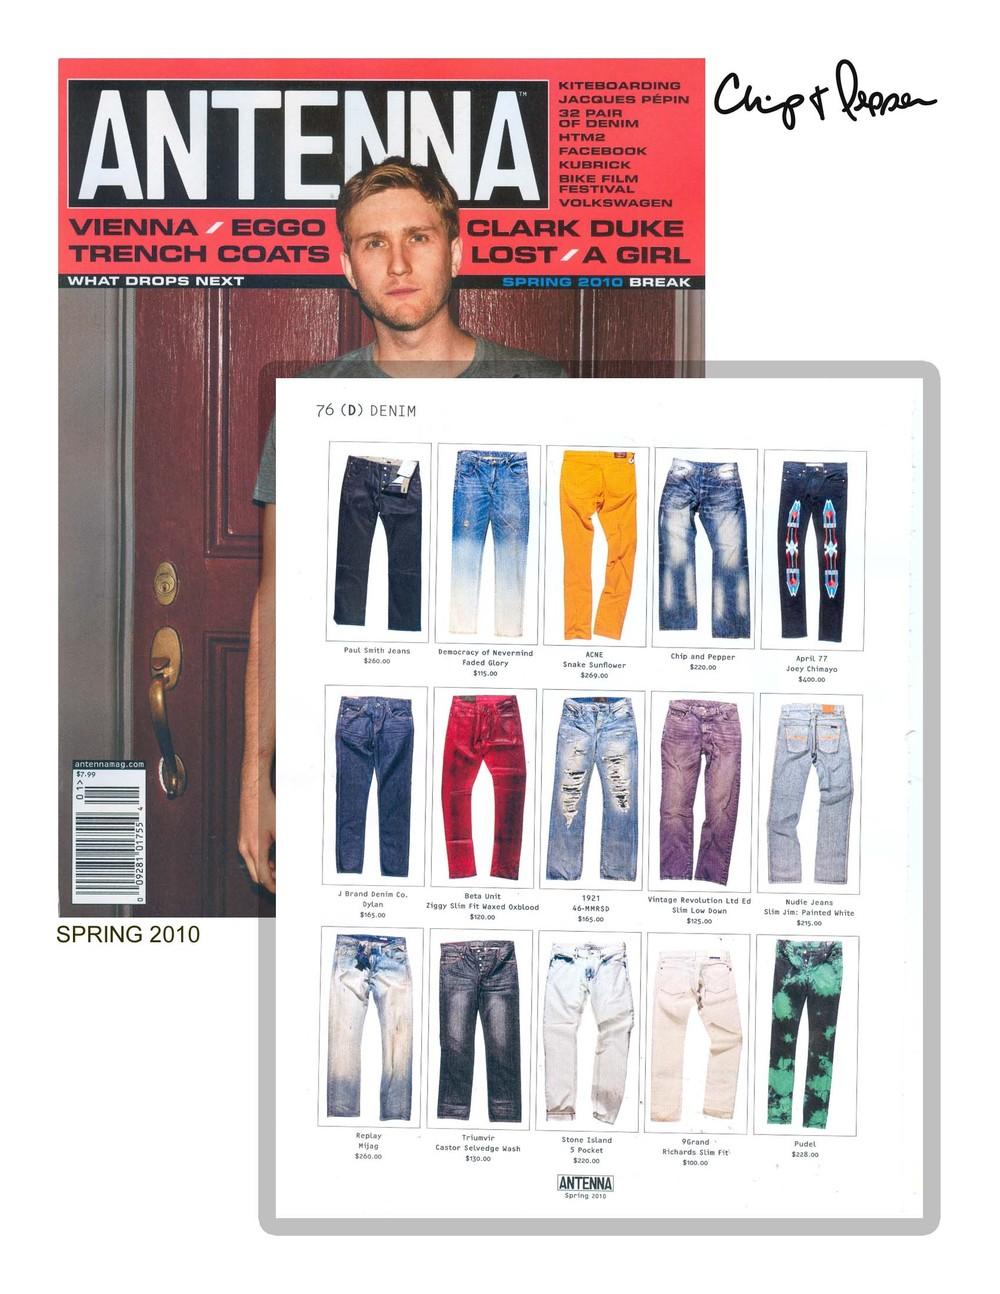 Antenna_Spring2010_Edit.jpg